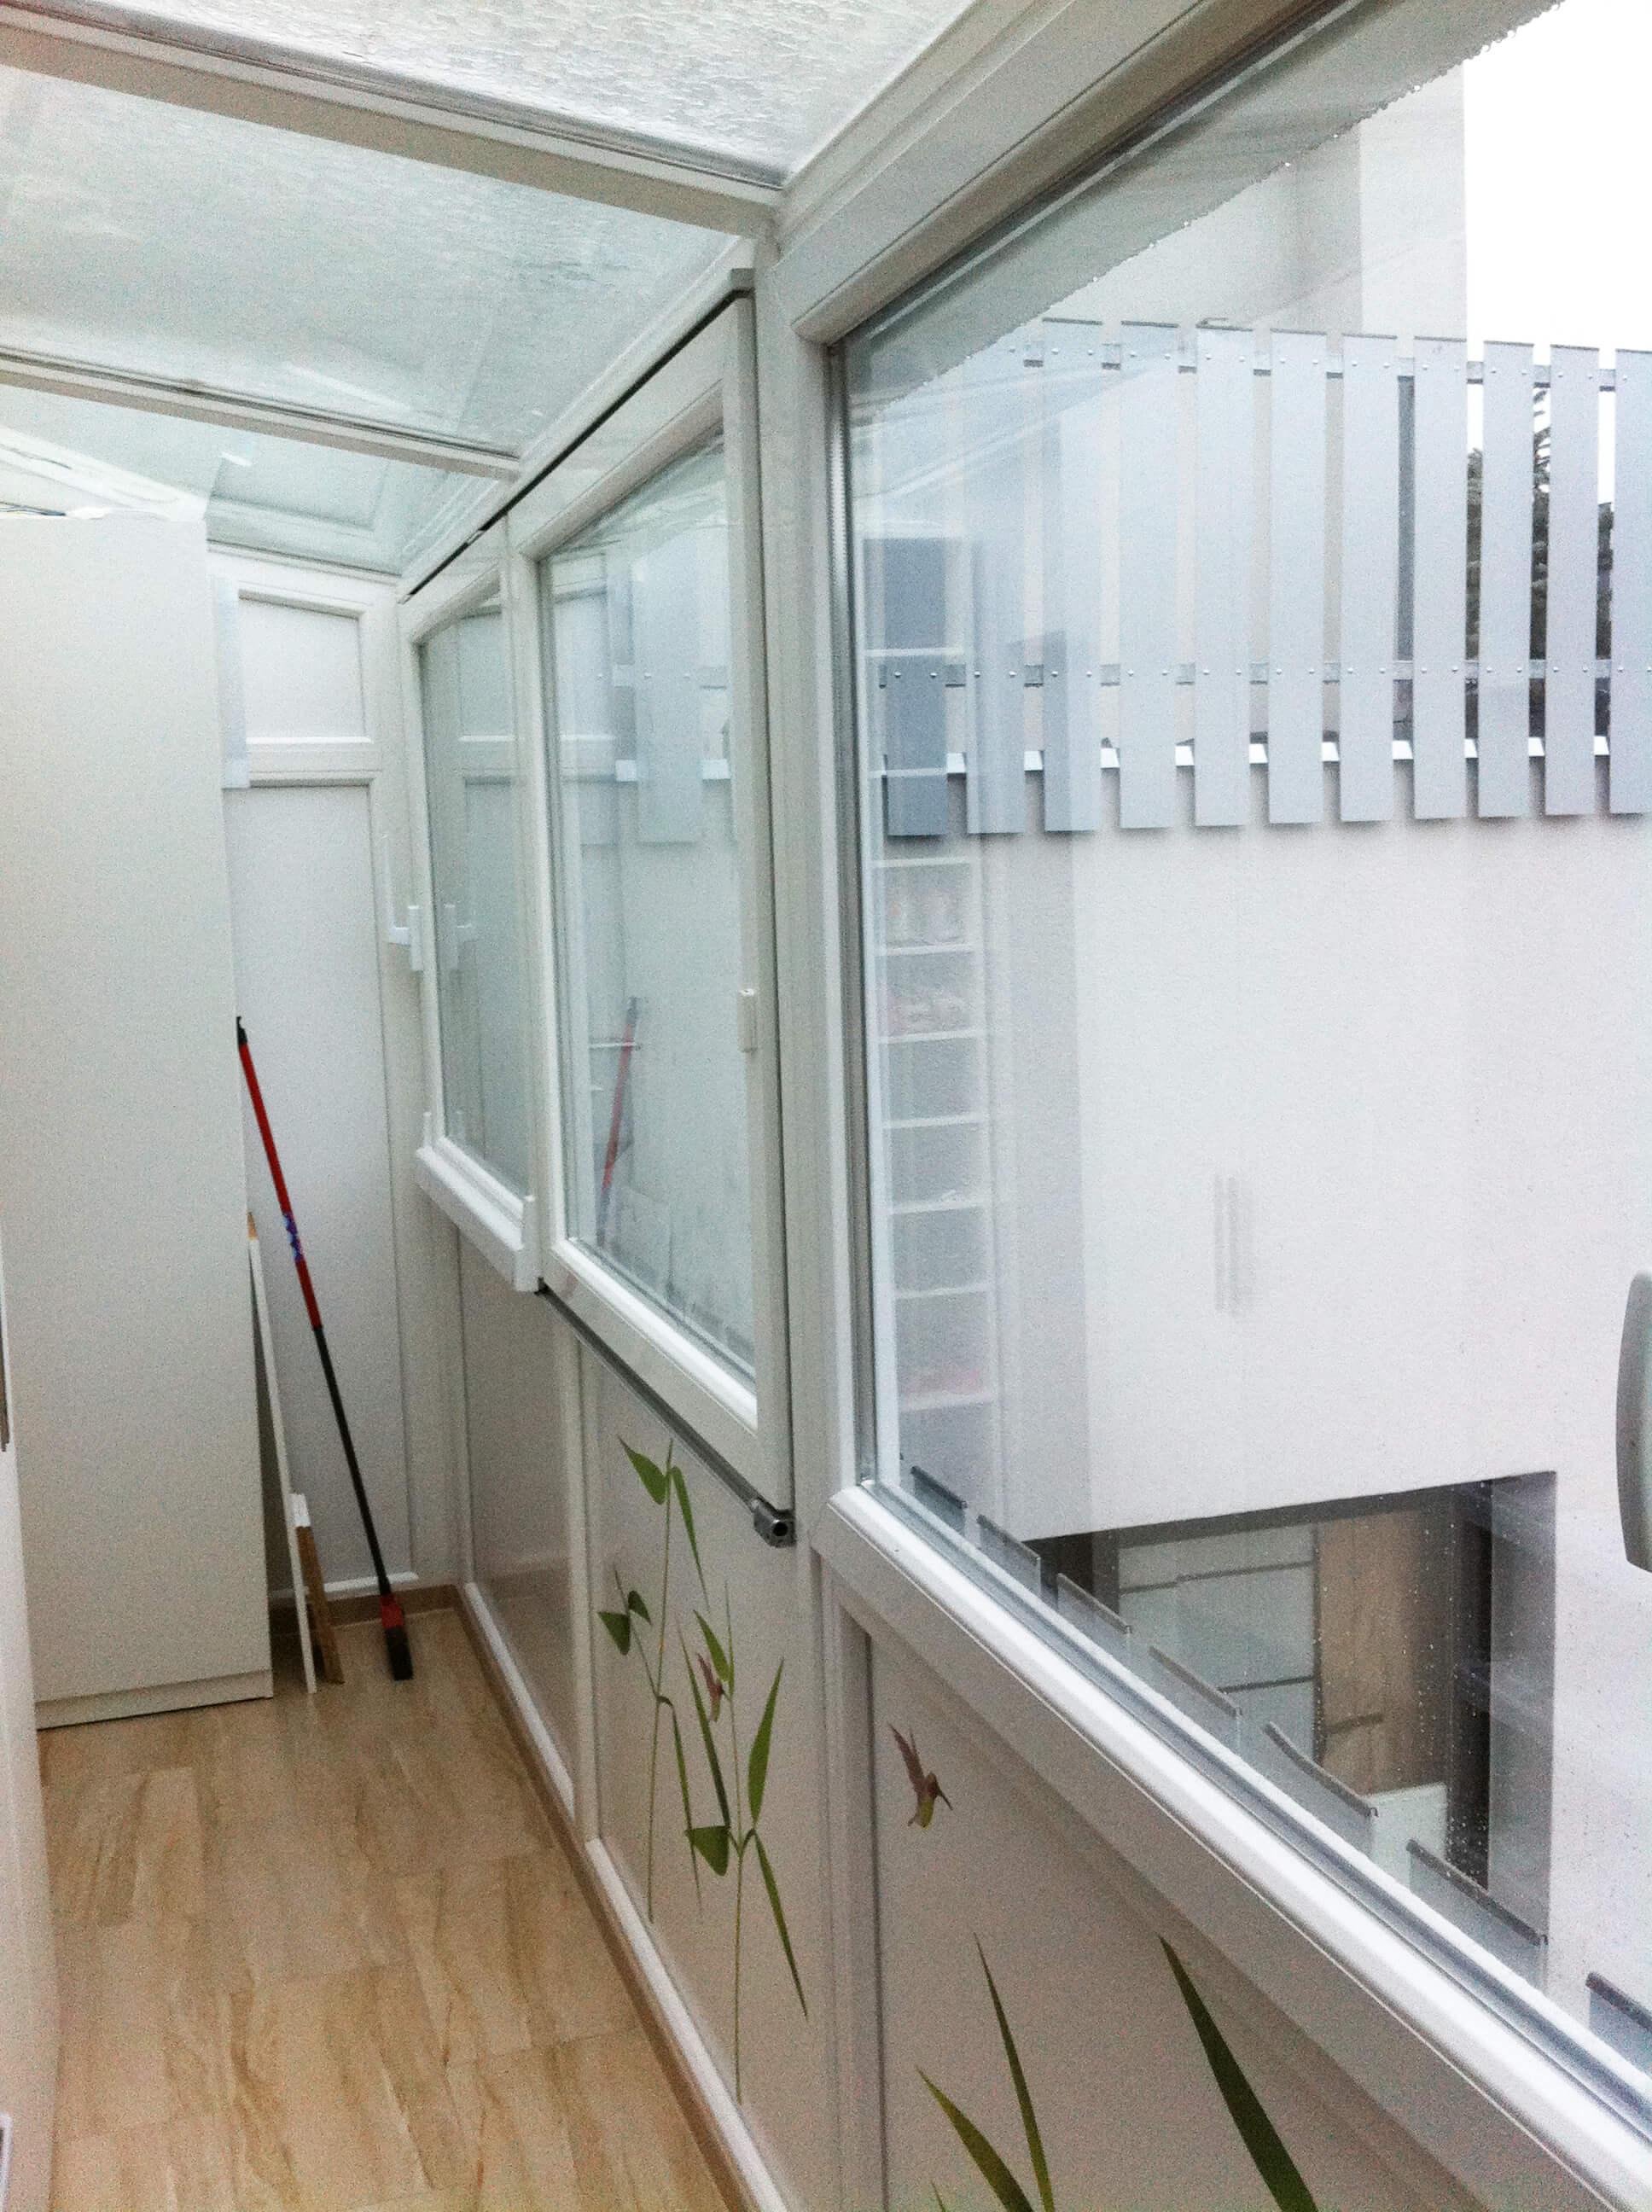 Balkonverbauten